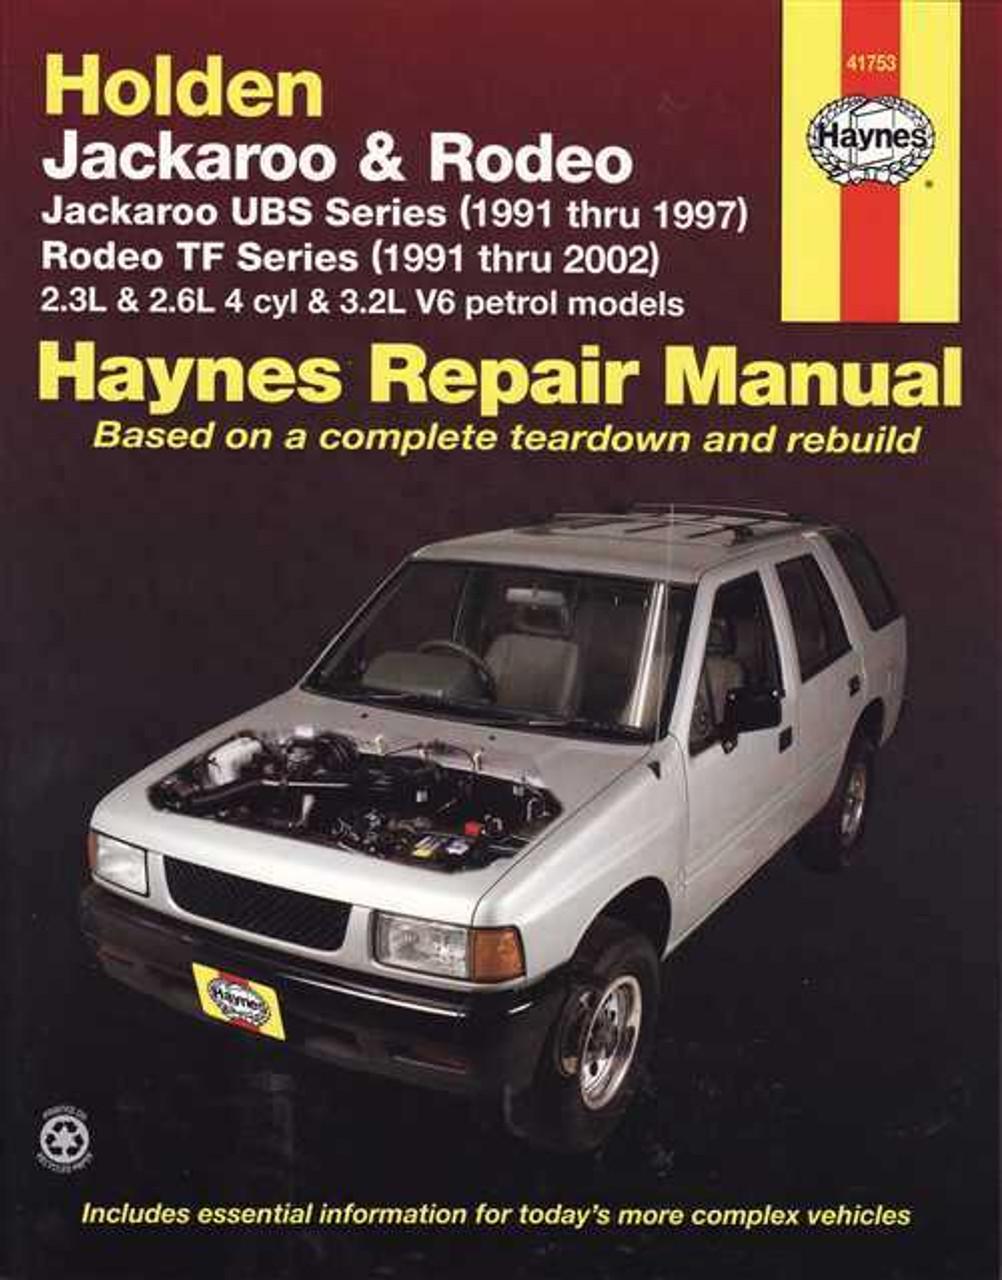 holden jackaroo amp rodeo 1991 2002 workshop manual rh automotobookshop com au 2015 Holden Jackaroo holden jackaroo workshop manual free download